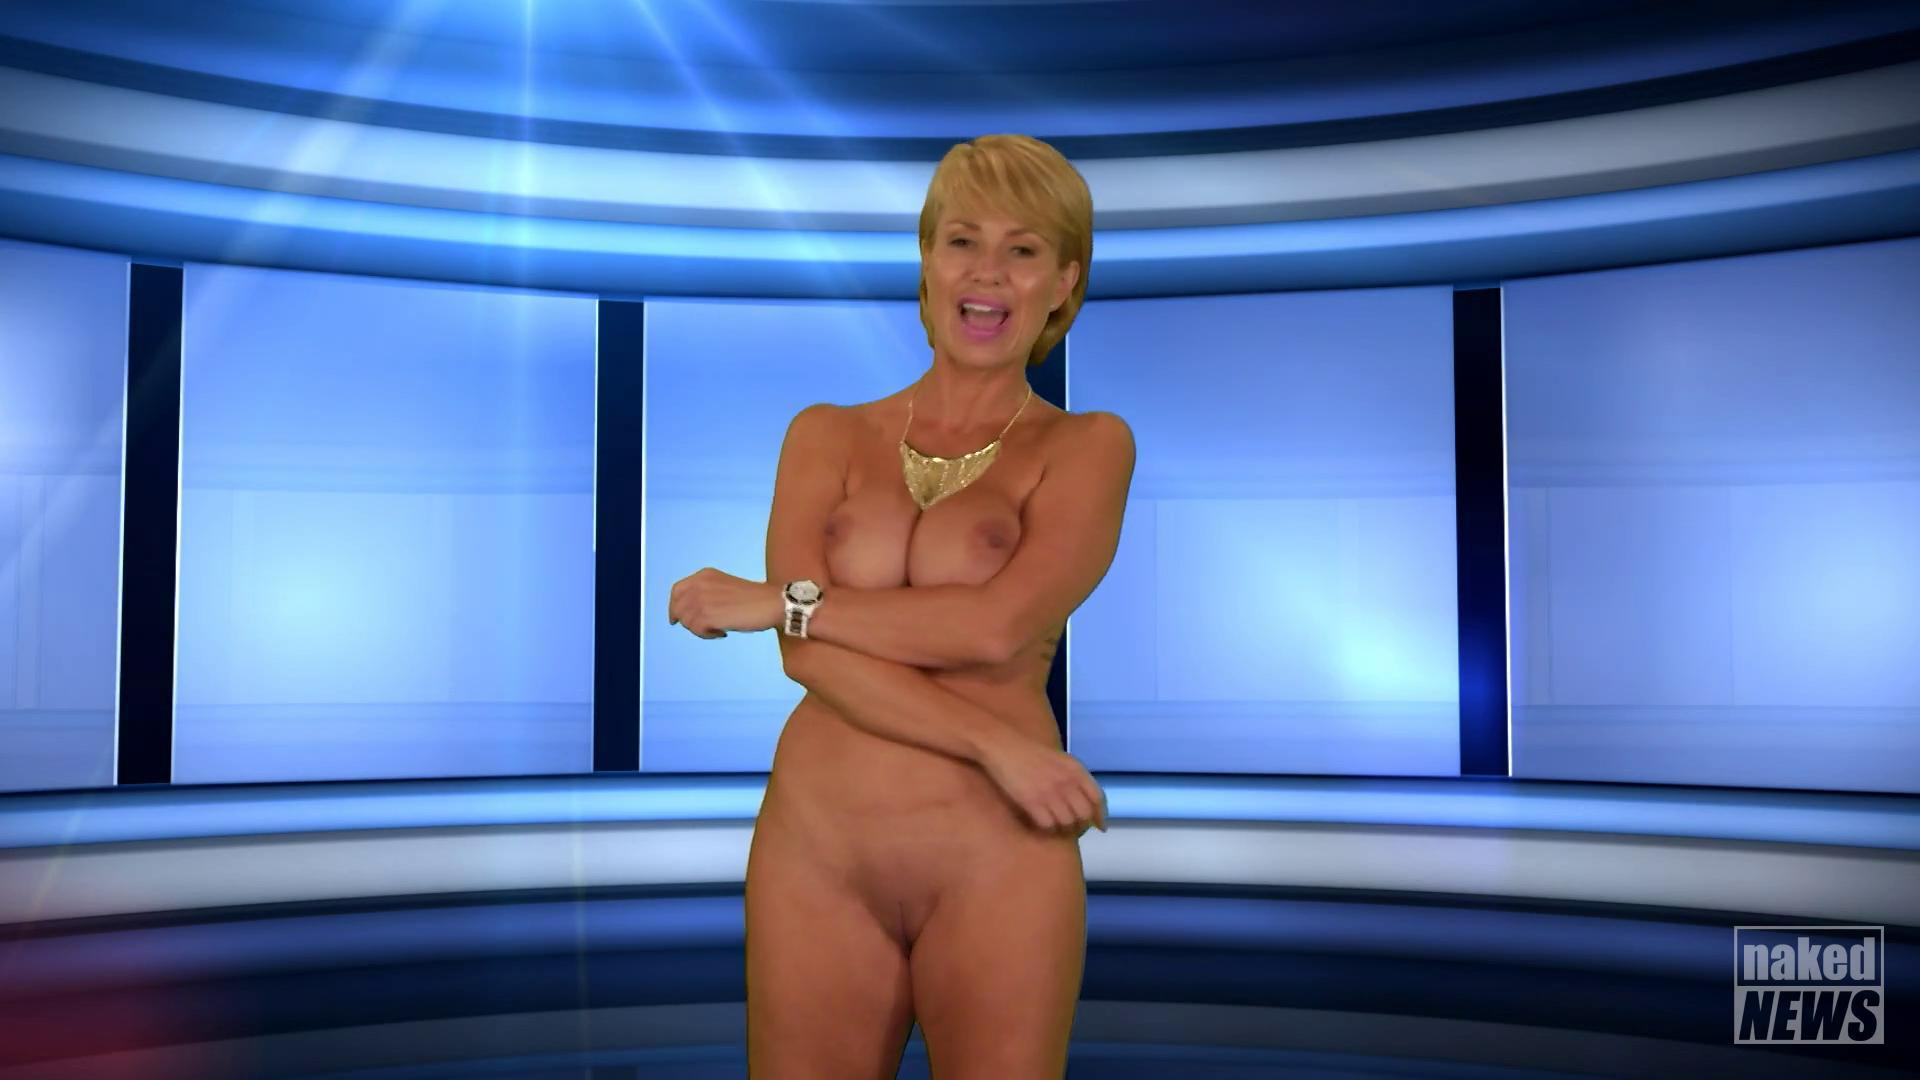 Naked news audition chloe naked news